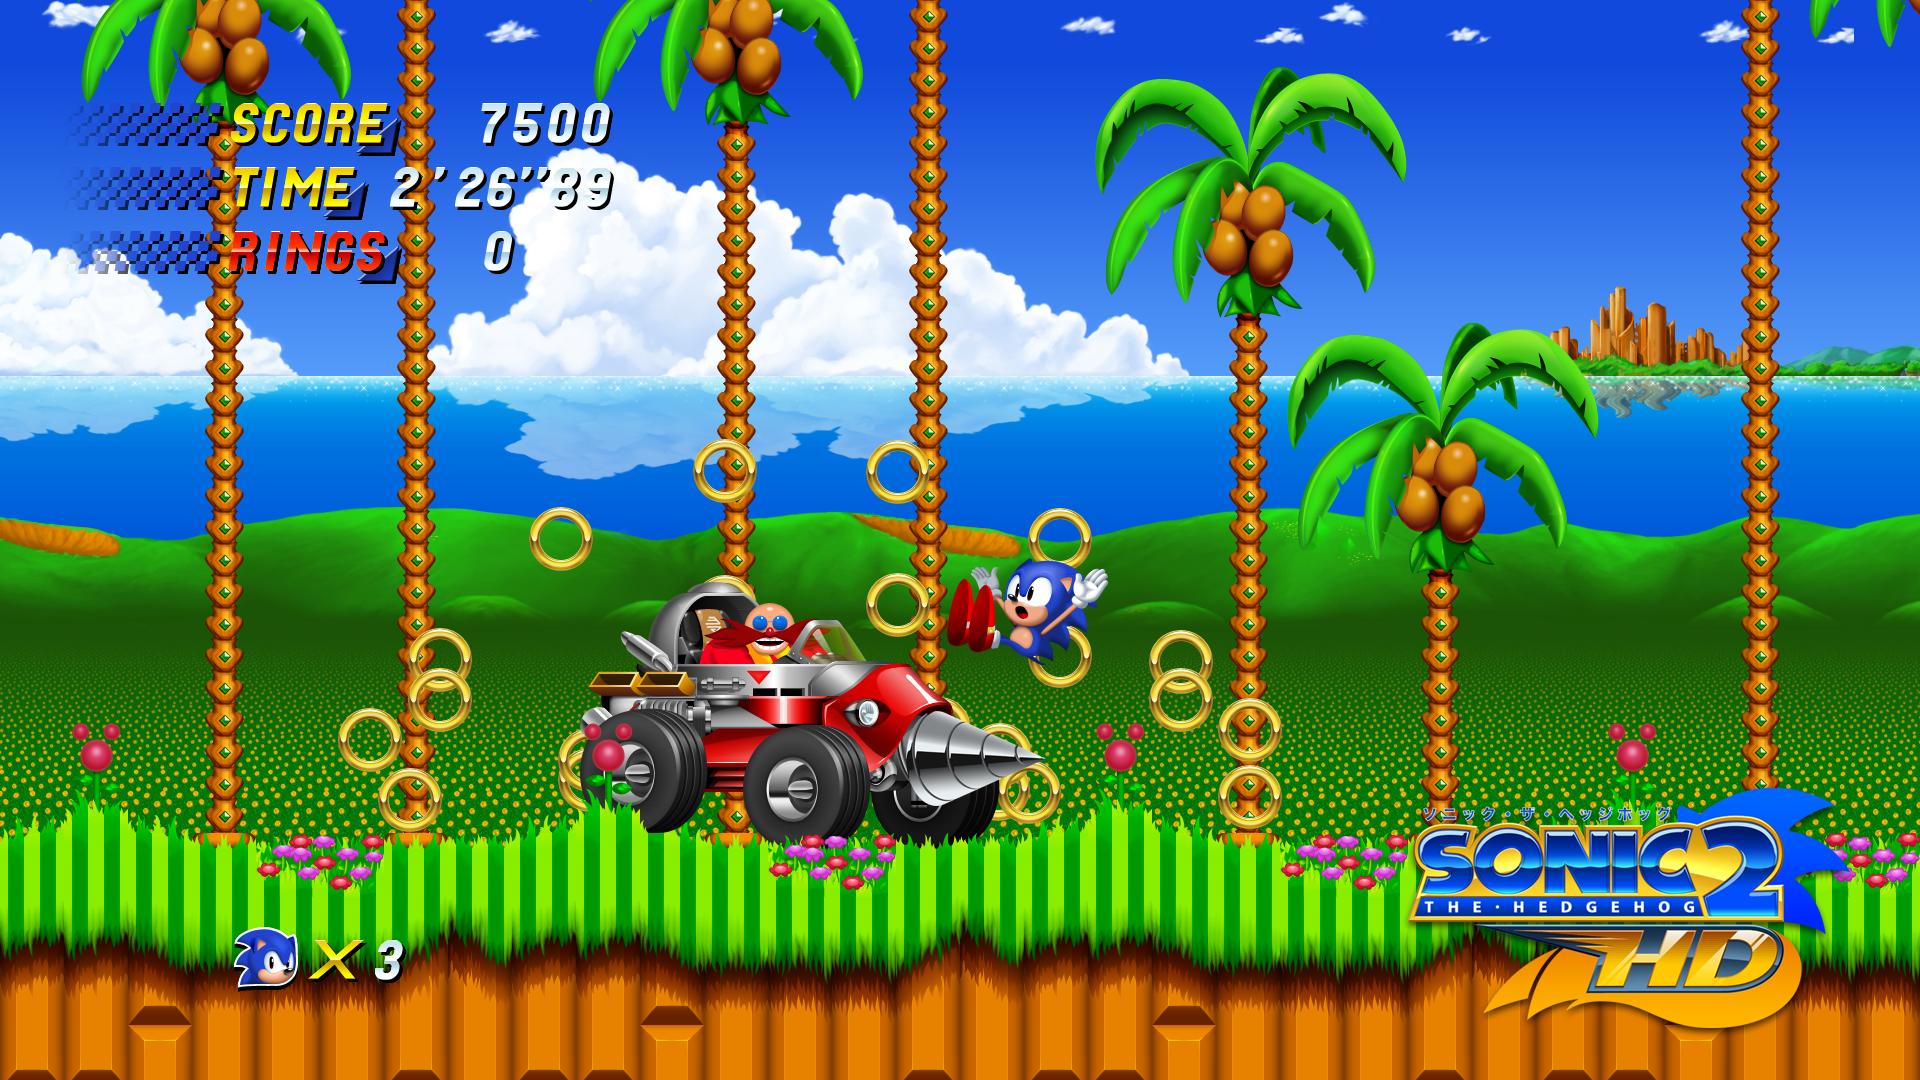 Sonic 2 HD 2d game art, Game art, Sonic